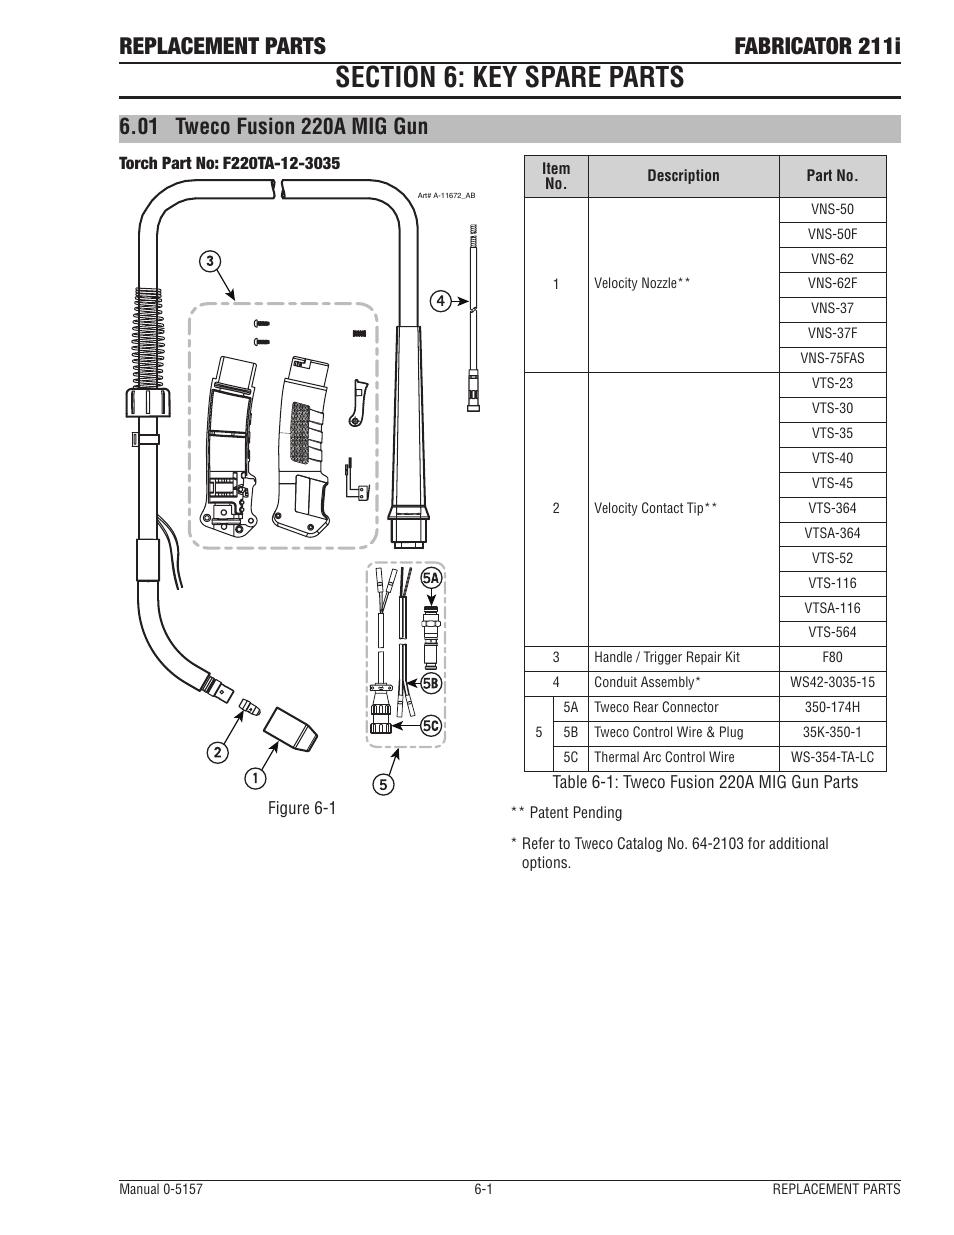 section 6 key spare parts 01 tweco fusion 220a mig gun. Black Bedroom Furniture Sets. Home Design Ideas